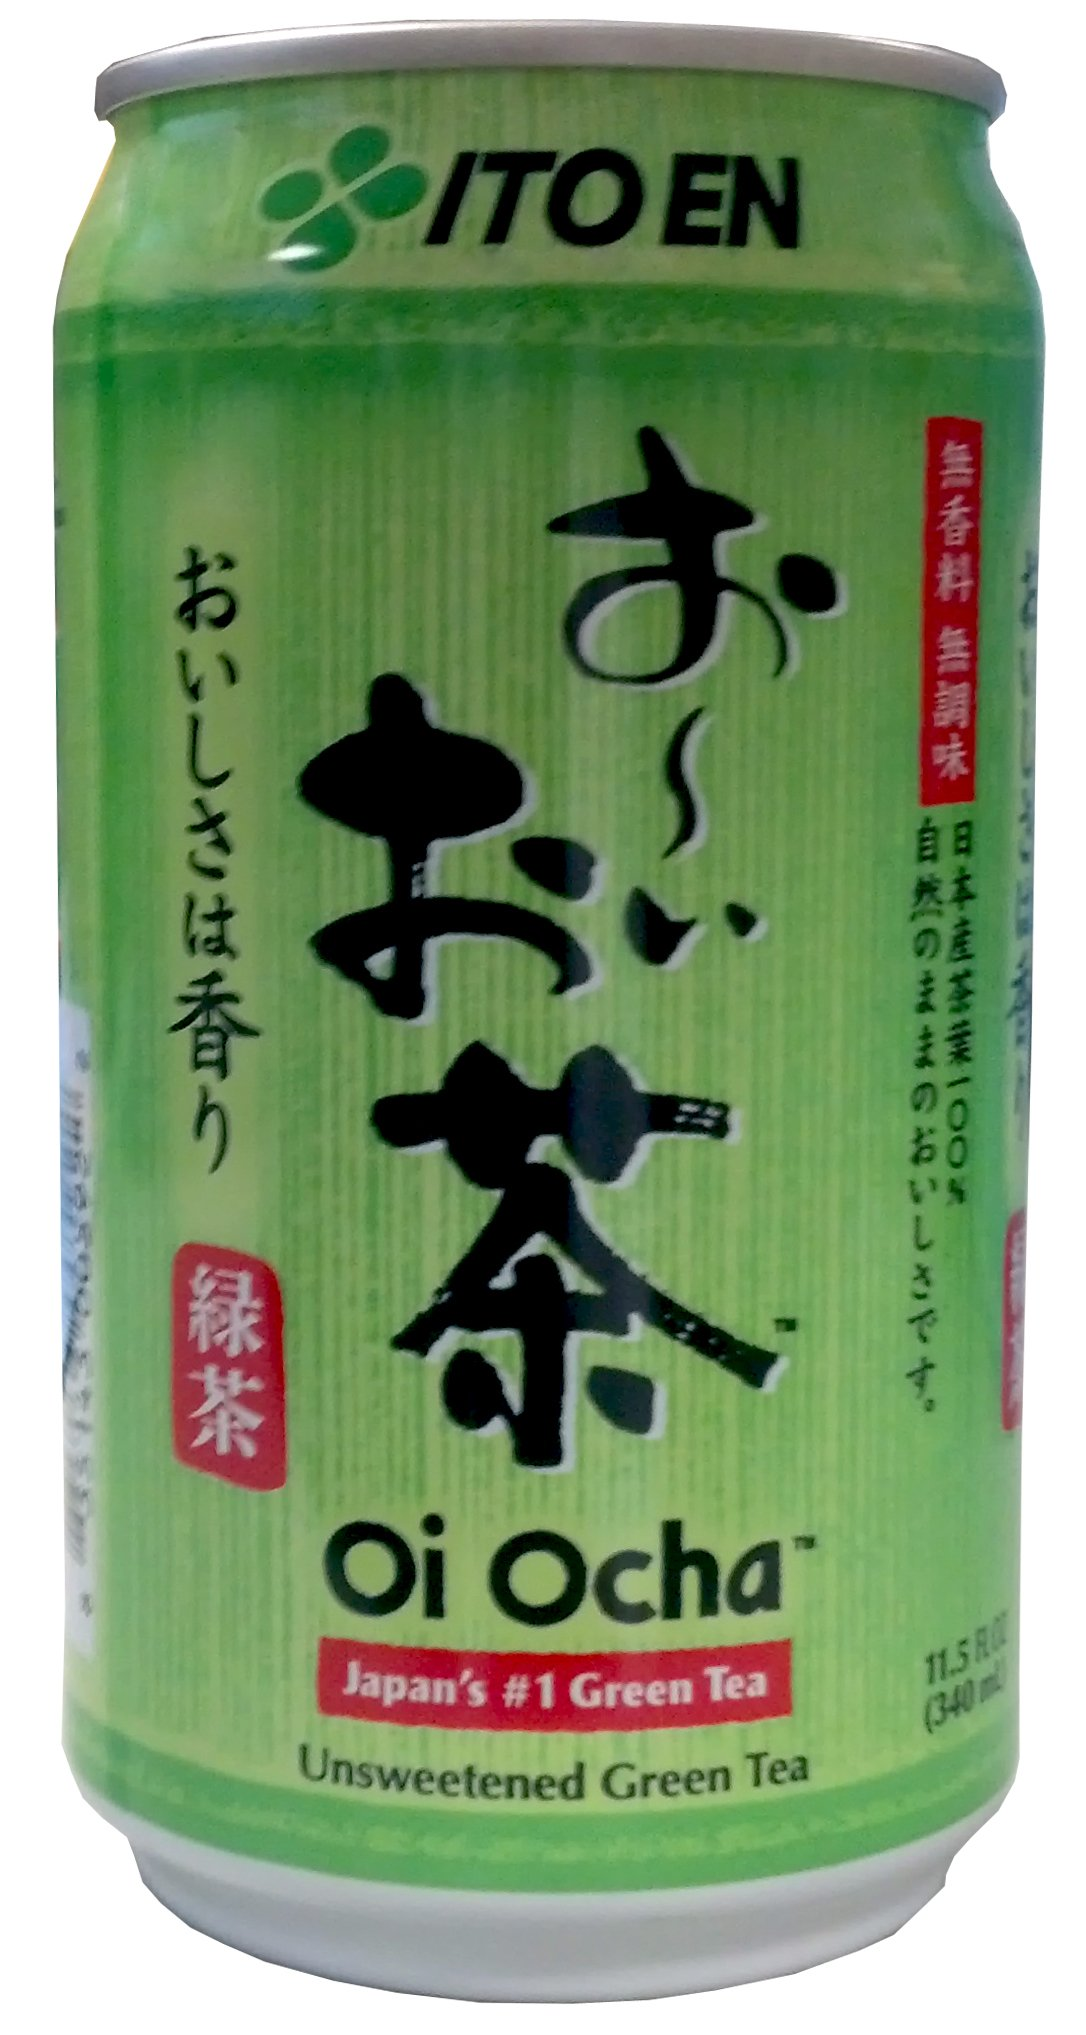 Itoen Green Tea, Unsweetened, 11.5-Ounce (Pack of 24) by Itoen